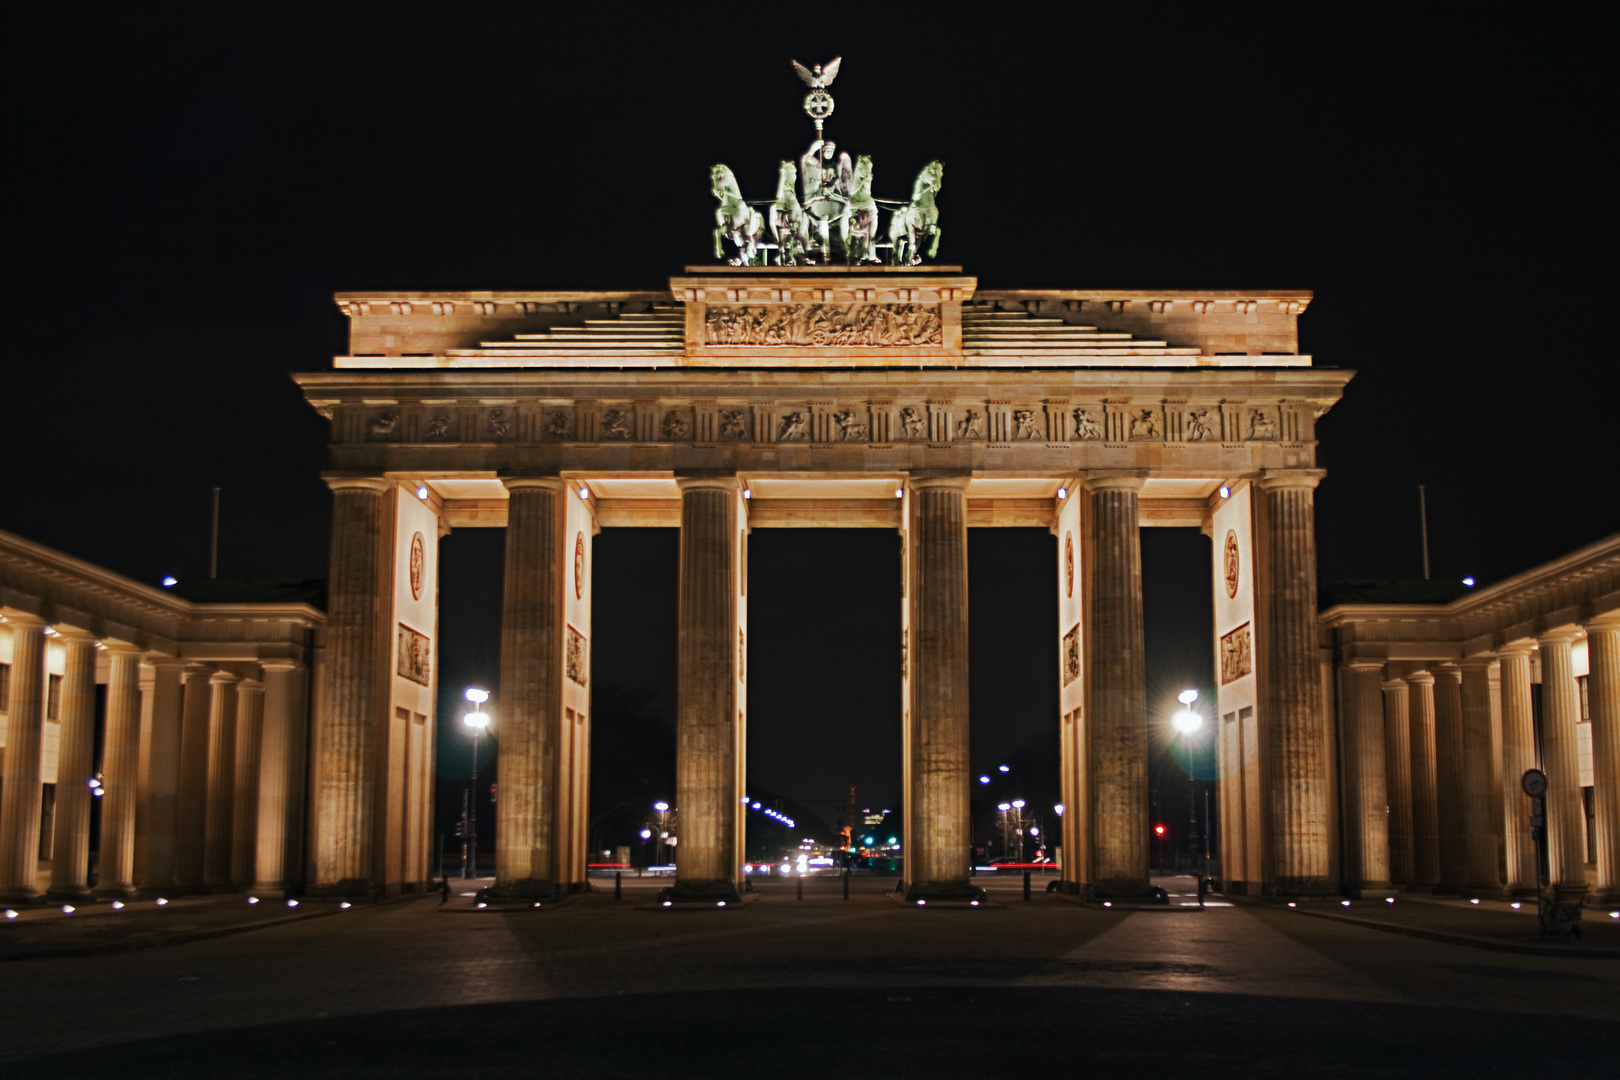 Brandenburger Tor by night